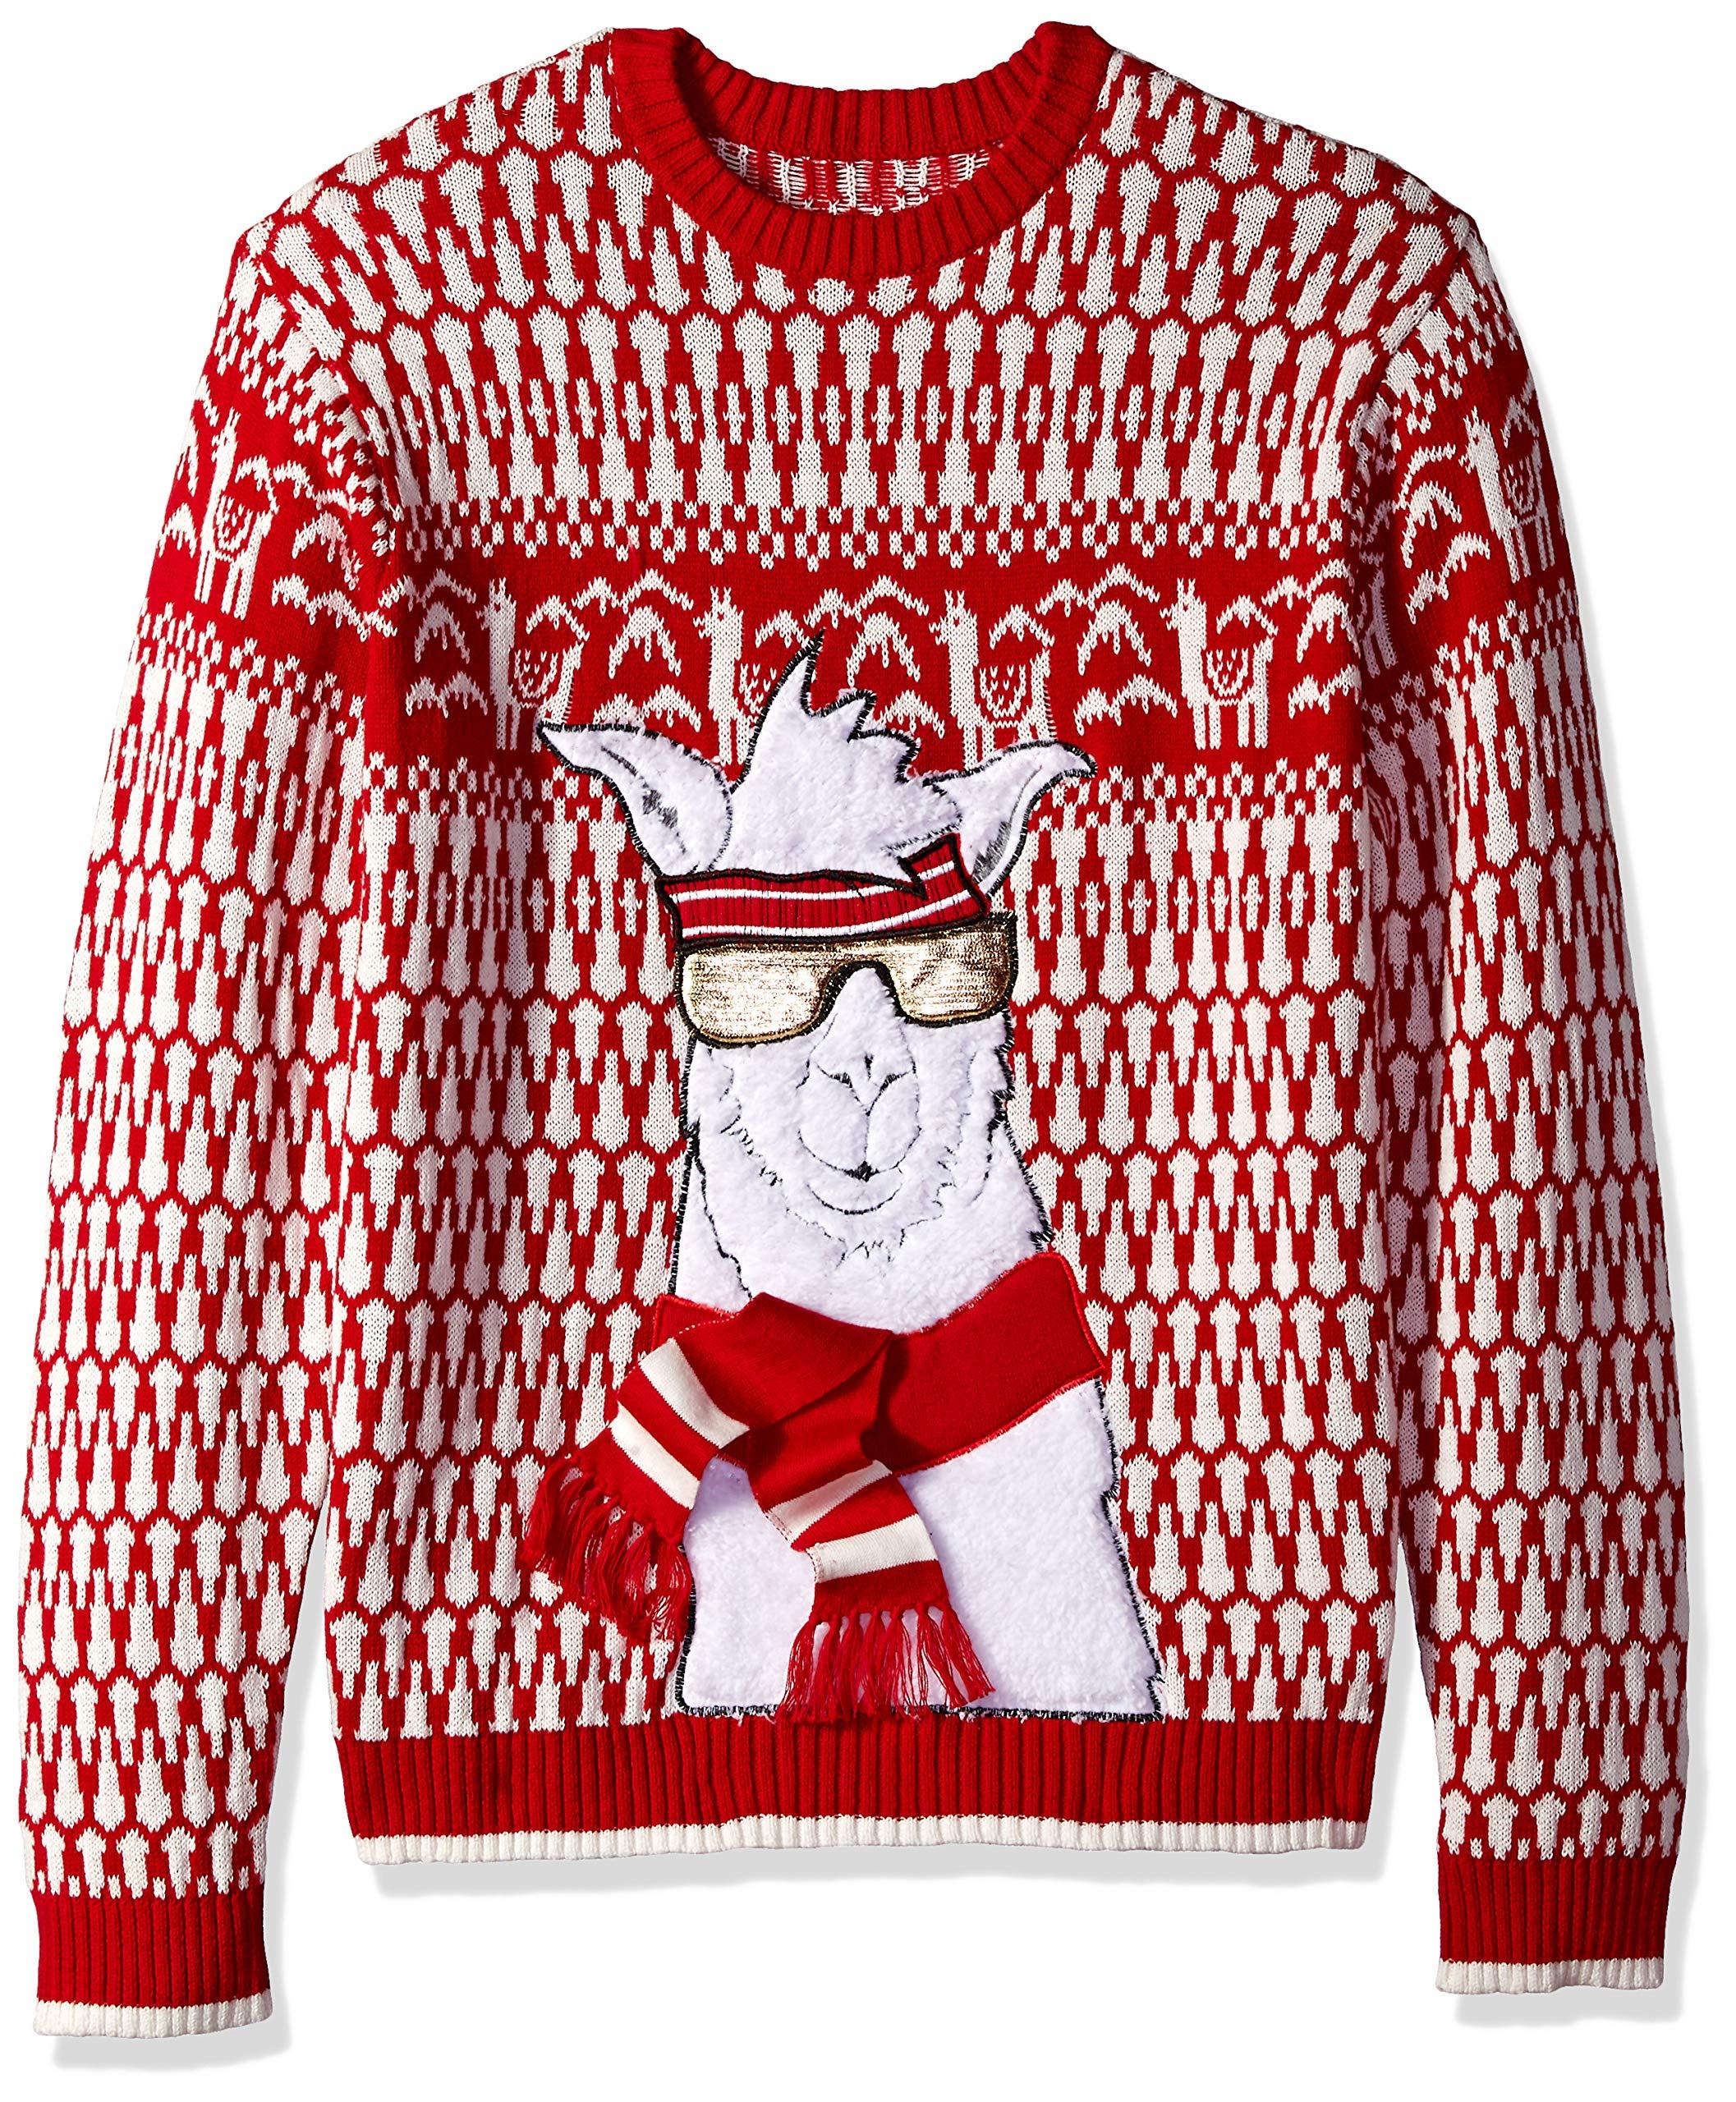 Blizzard Bay Boys Long Sleeve Crew Neck Llama Pegasus Ugly Christmas Sweater